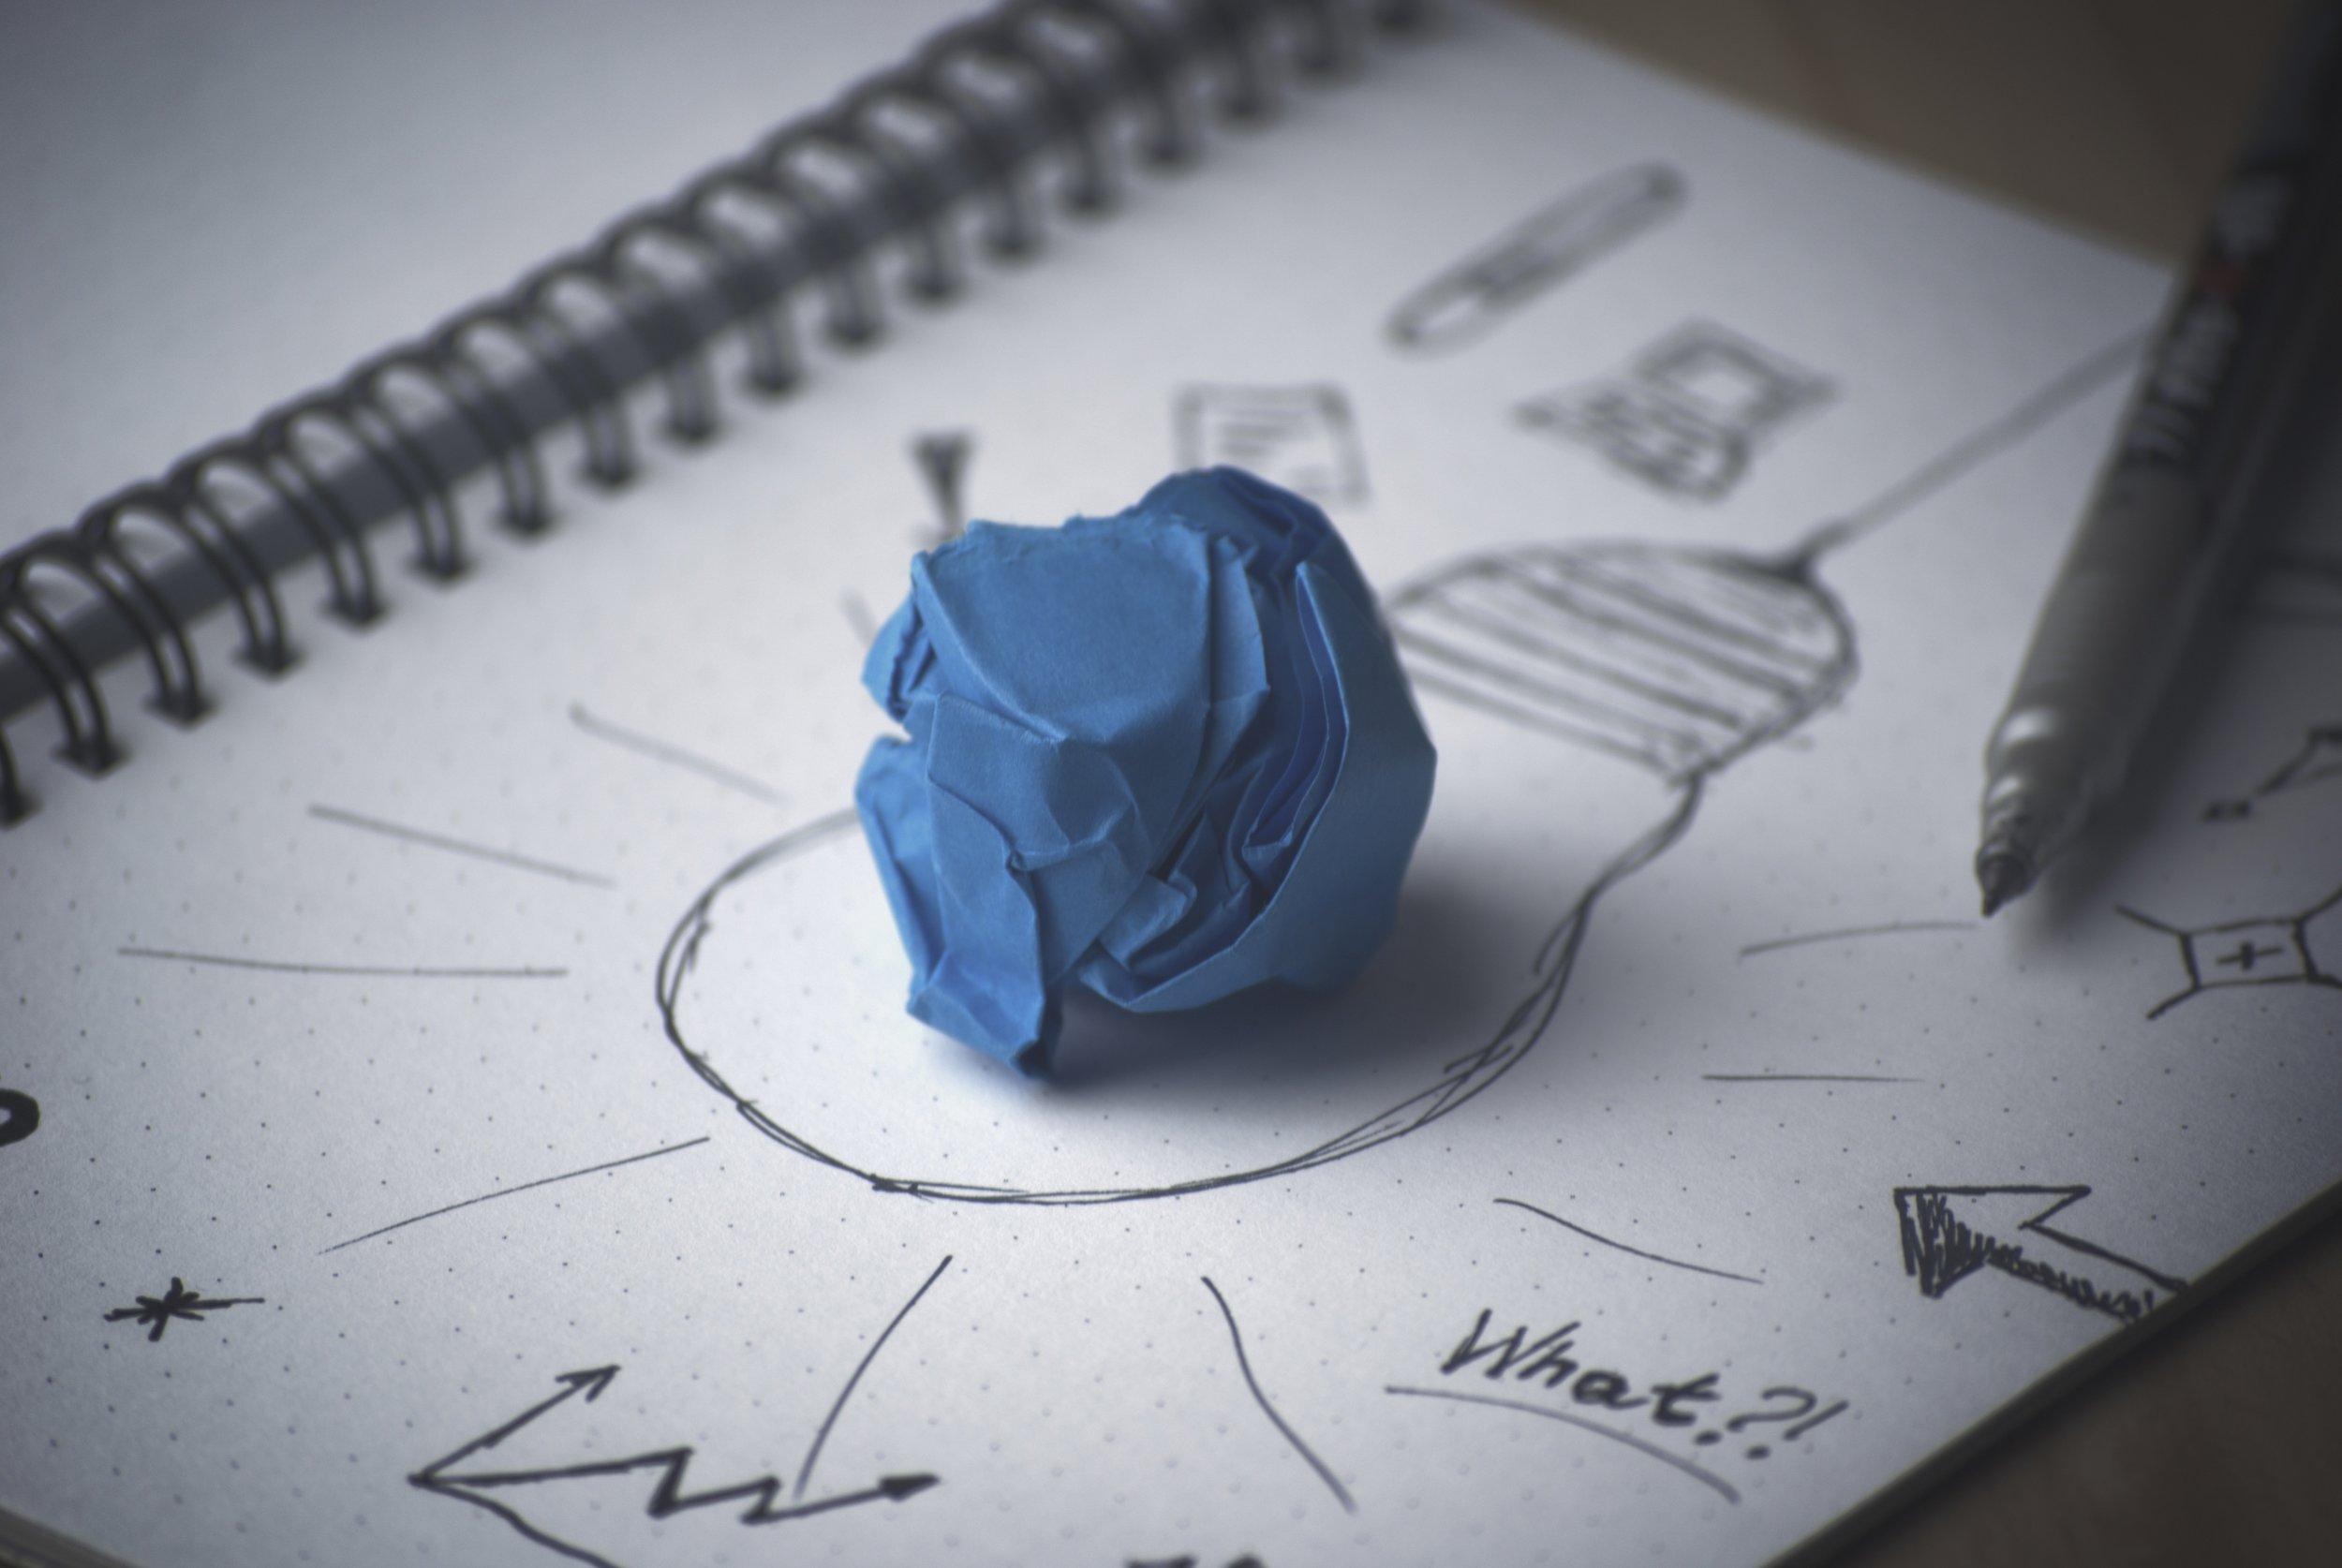 writing-pencil-creative-light-technology-thinking-714869-pxhere.com.jpg